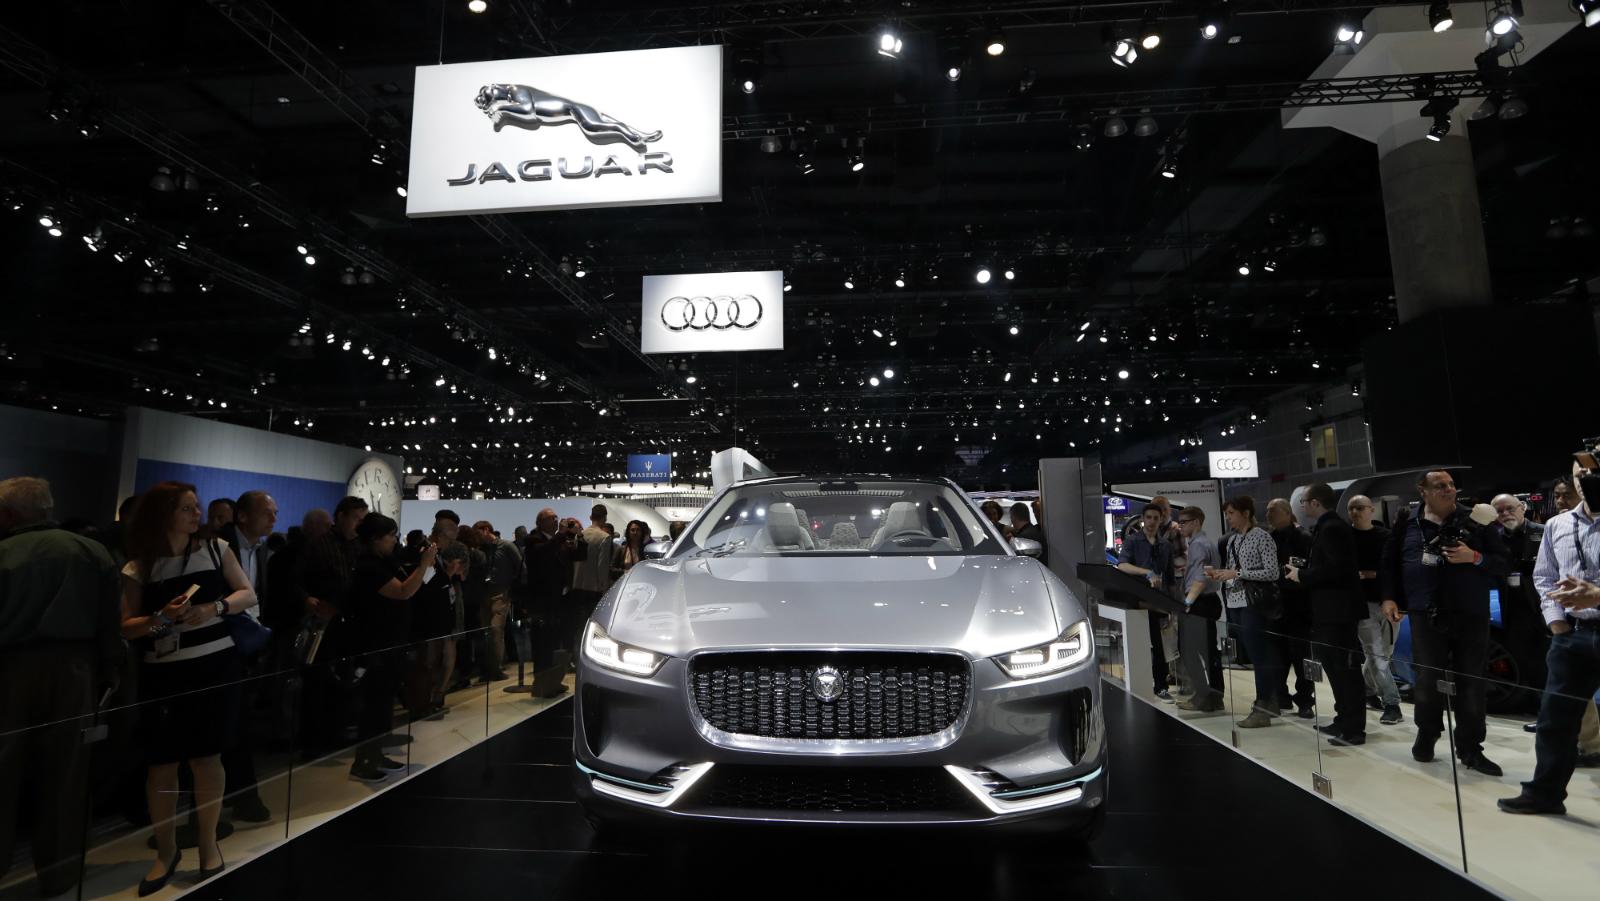 Jaguar-Tata Motors